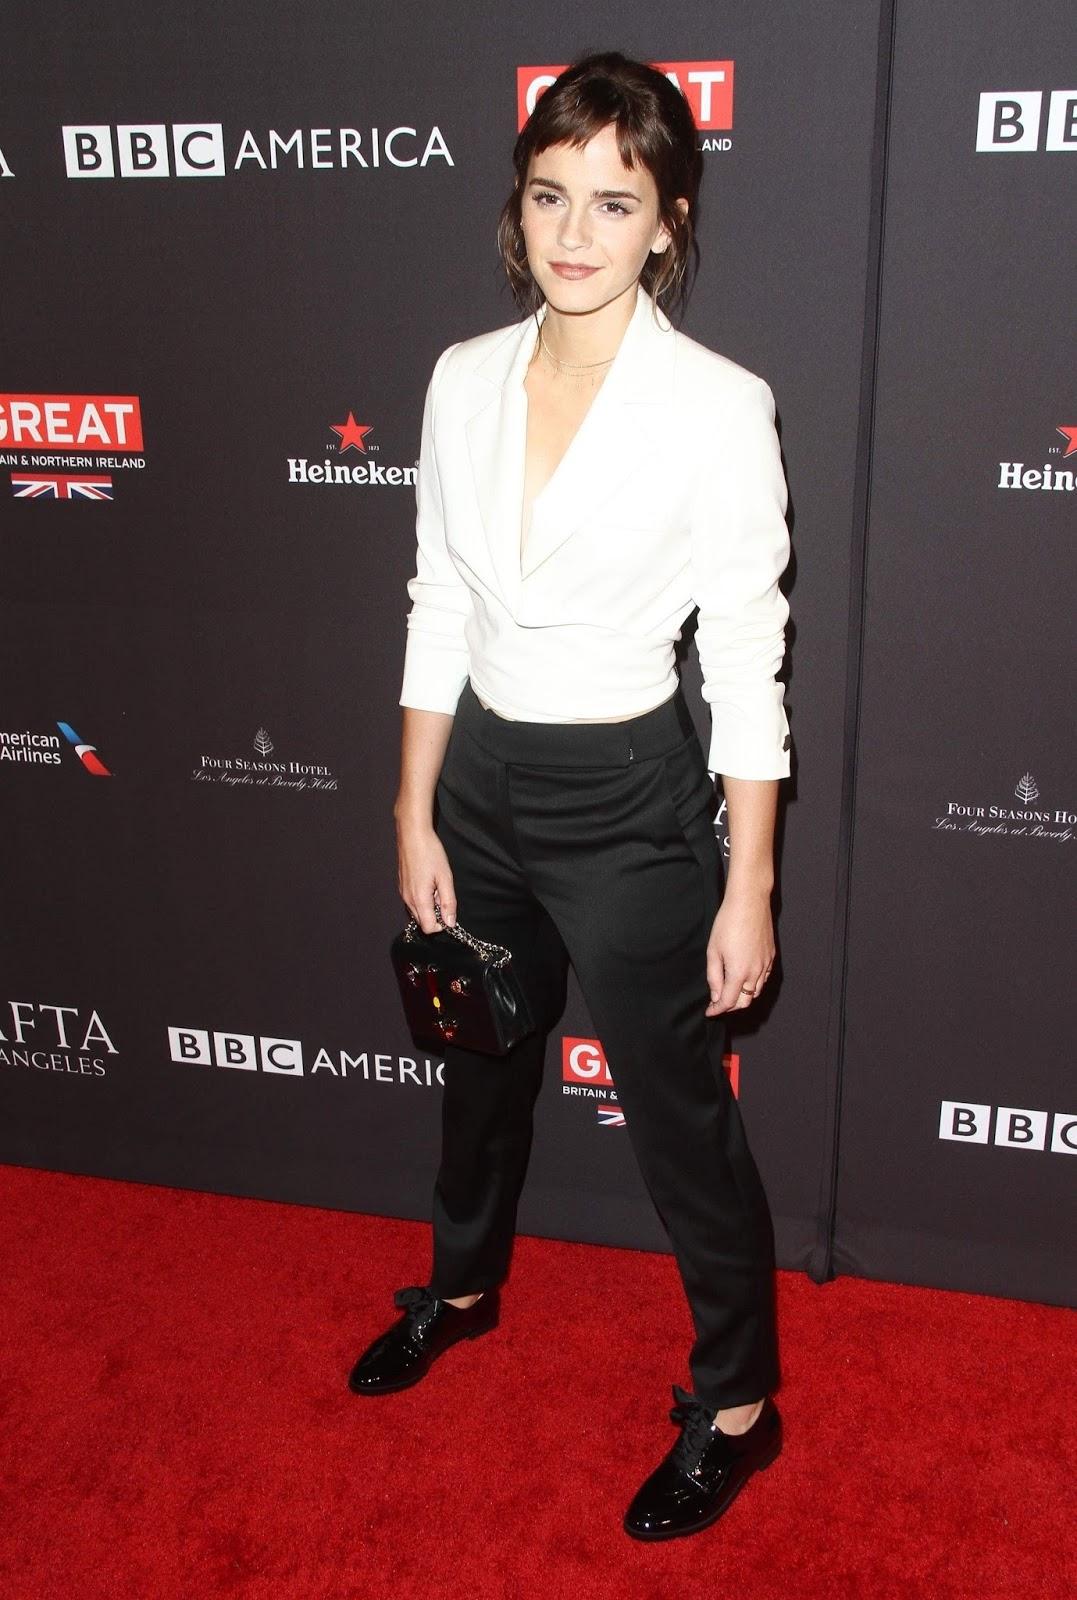 Emma Watson new haircut at The BAFTA Los Angeles Tea Party